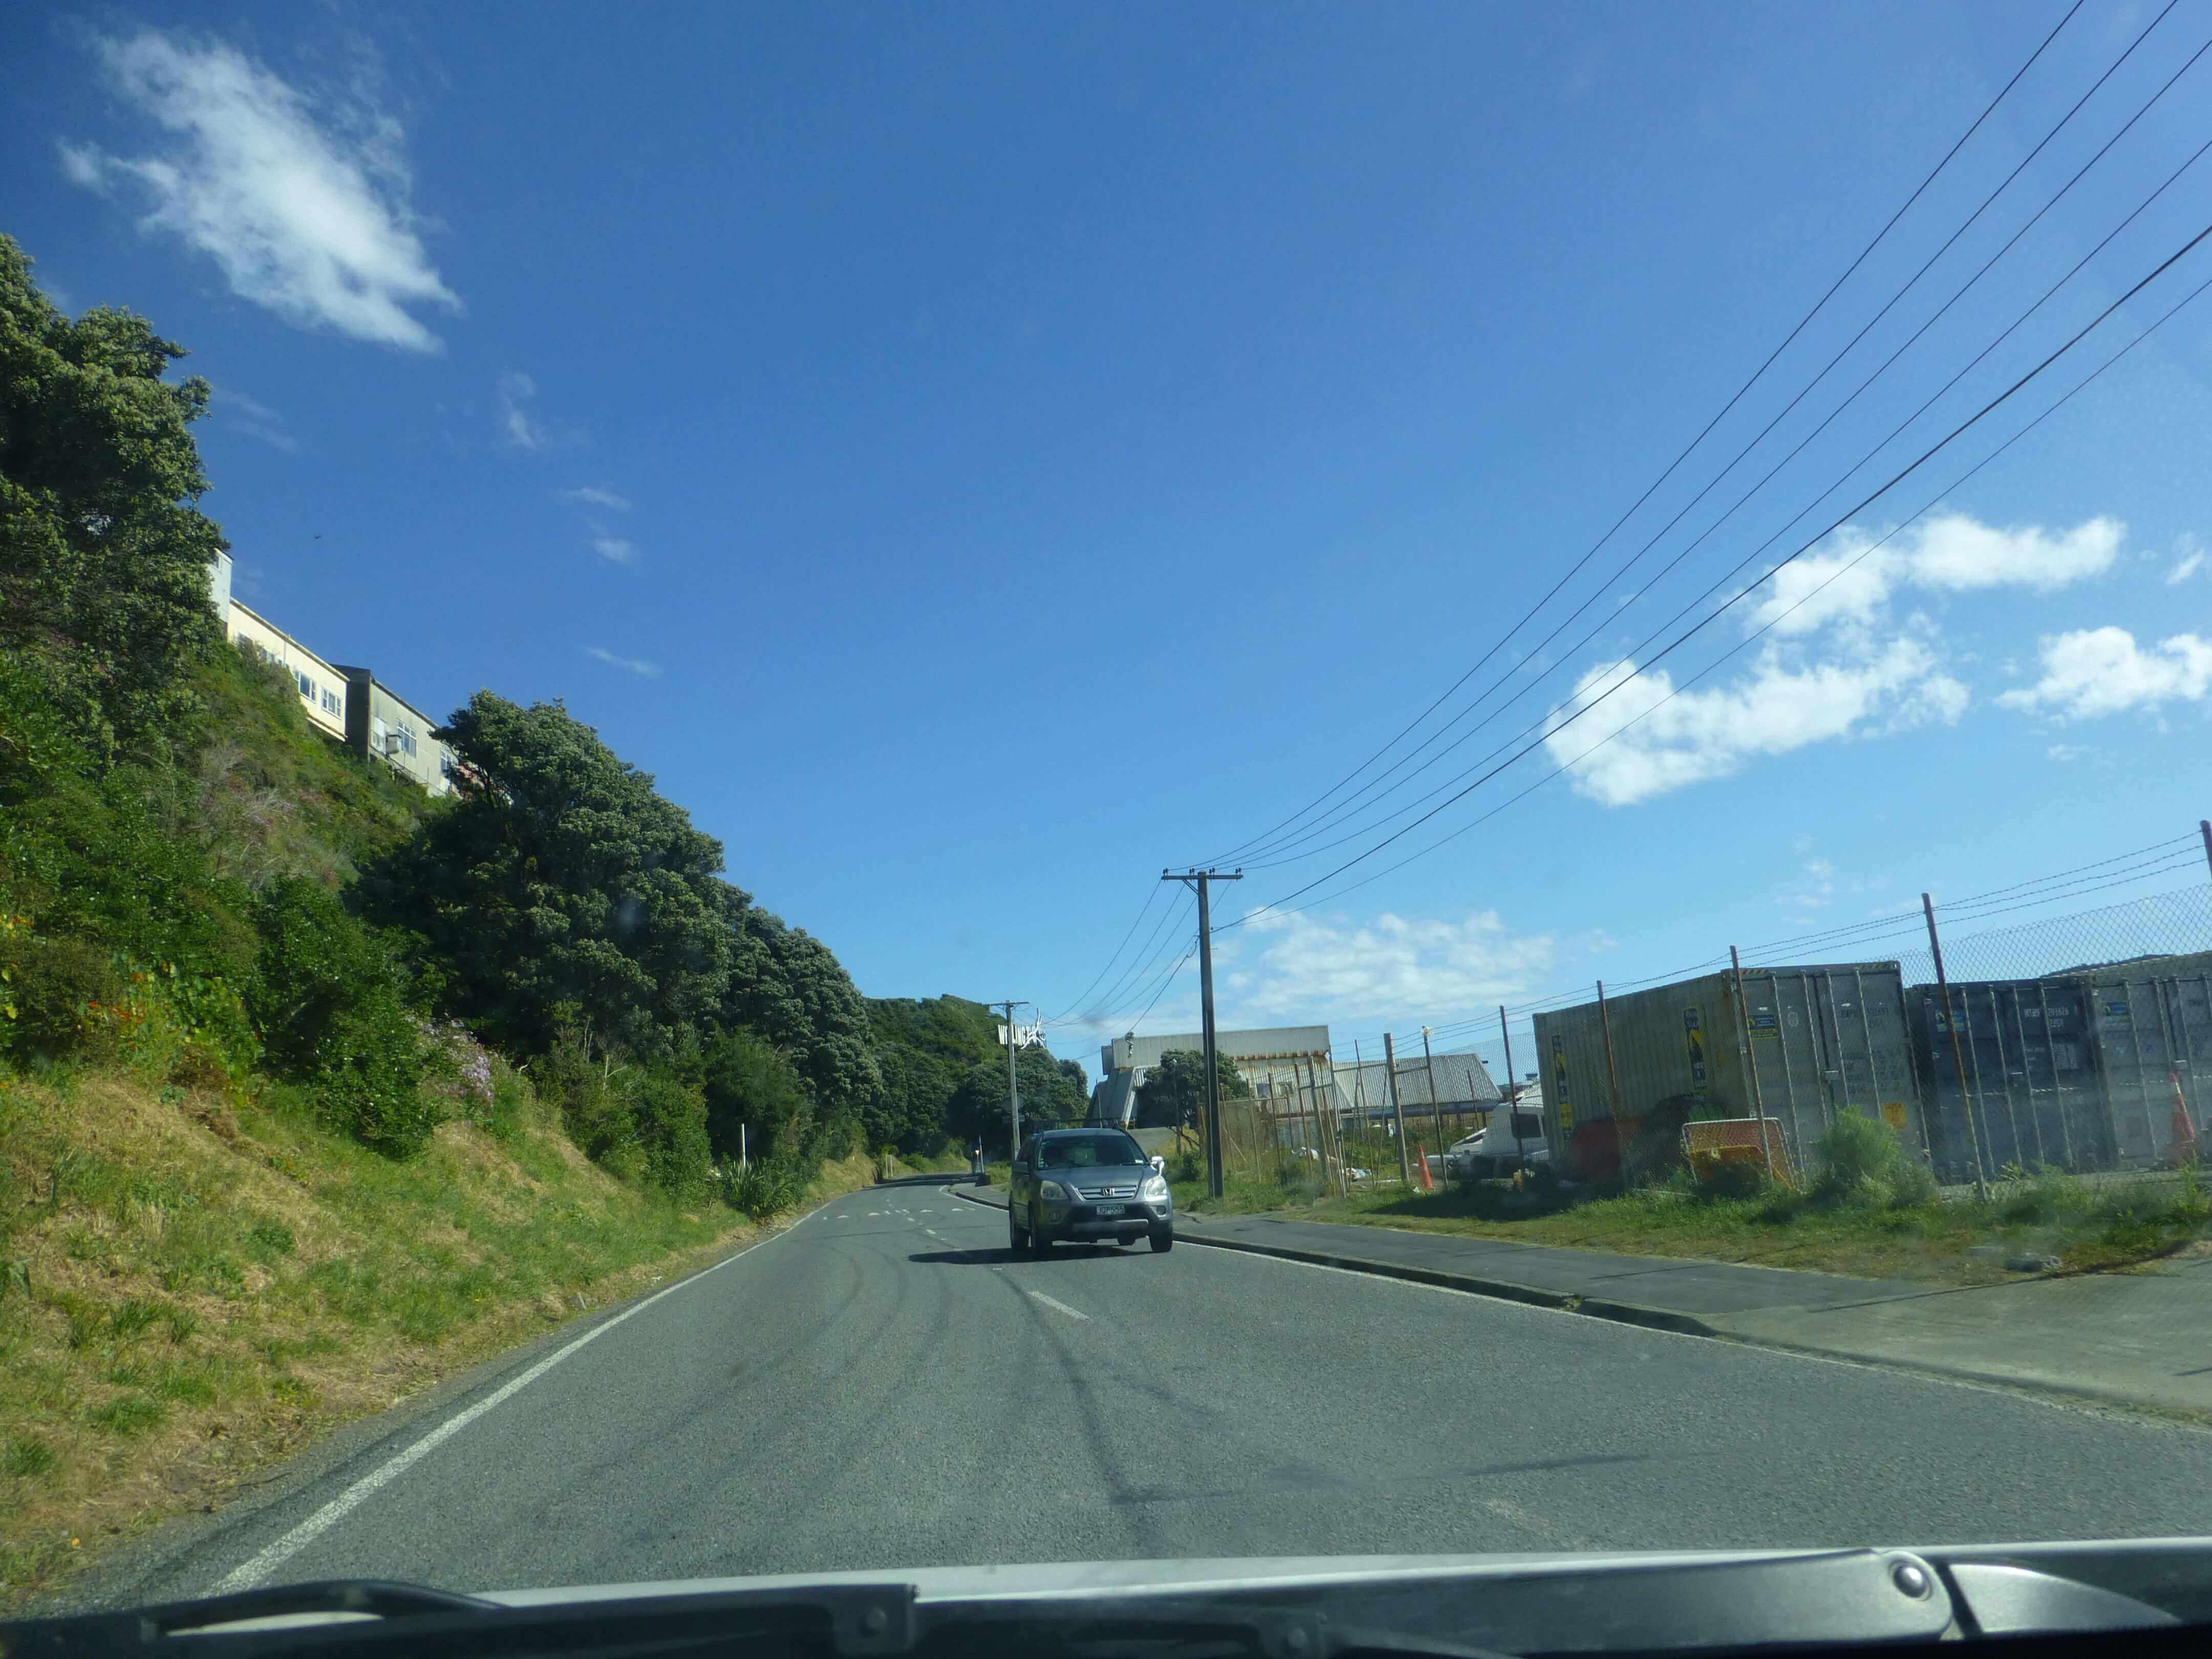 Wellington, in Miramar auf dem Weg zum Weta Shop, Weit-weg.reisen 6